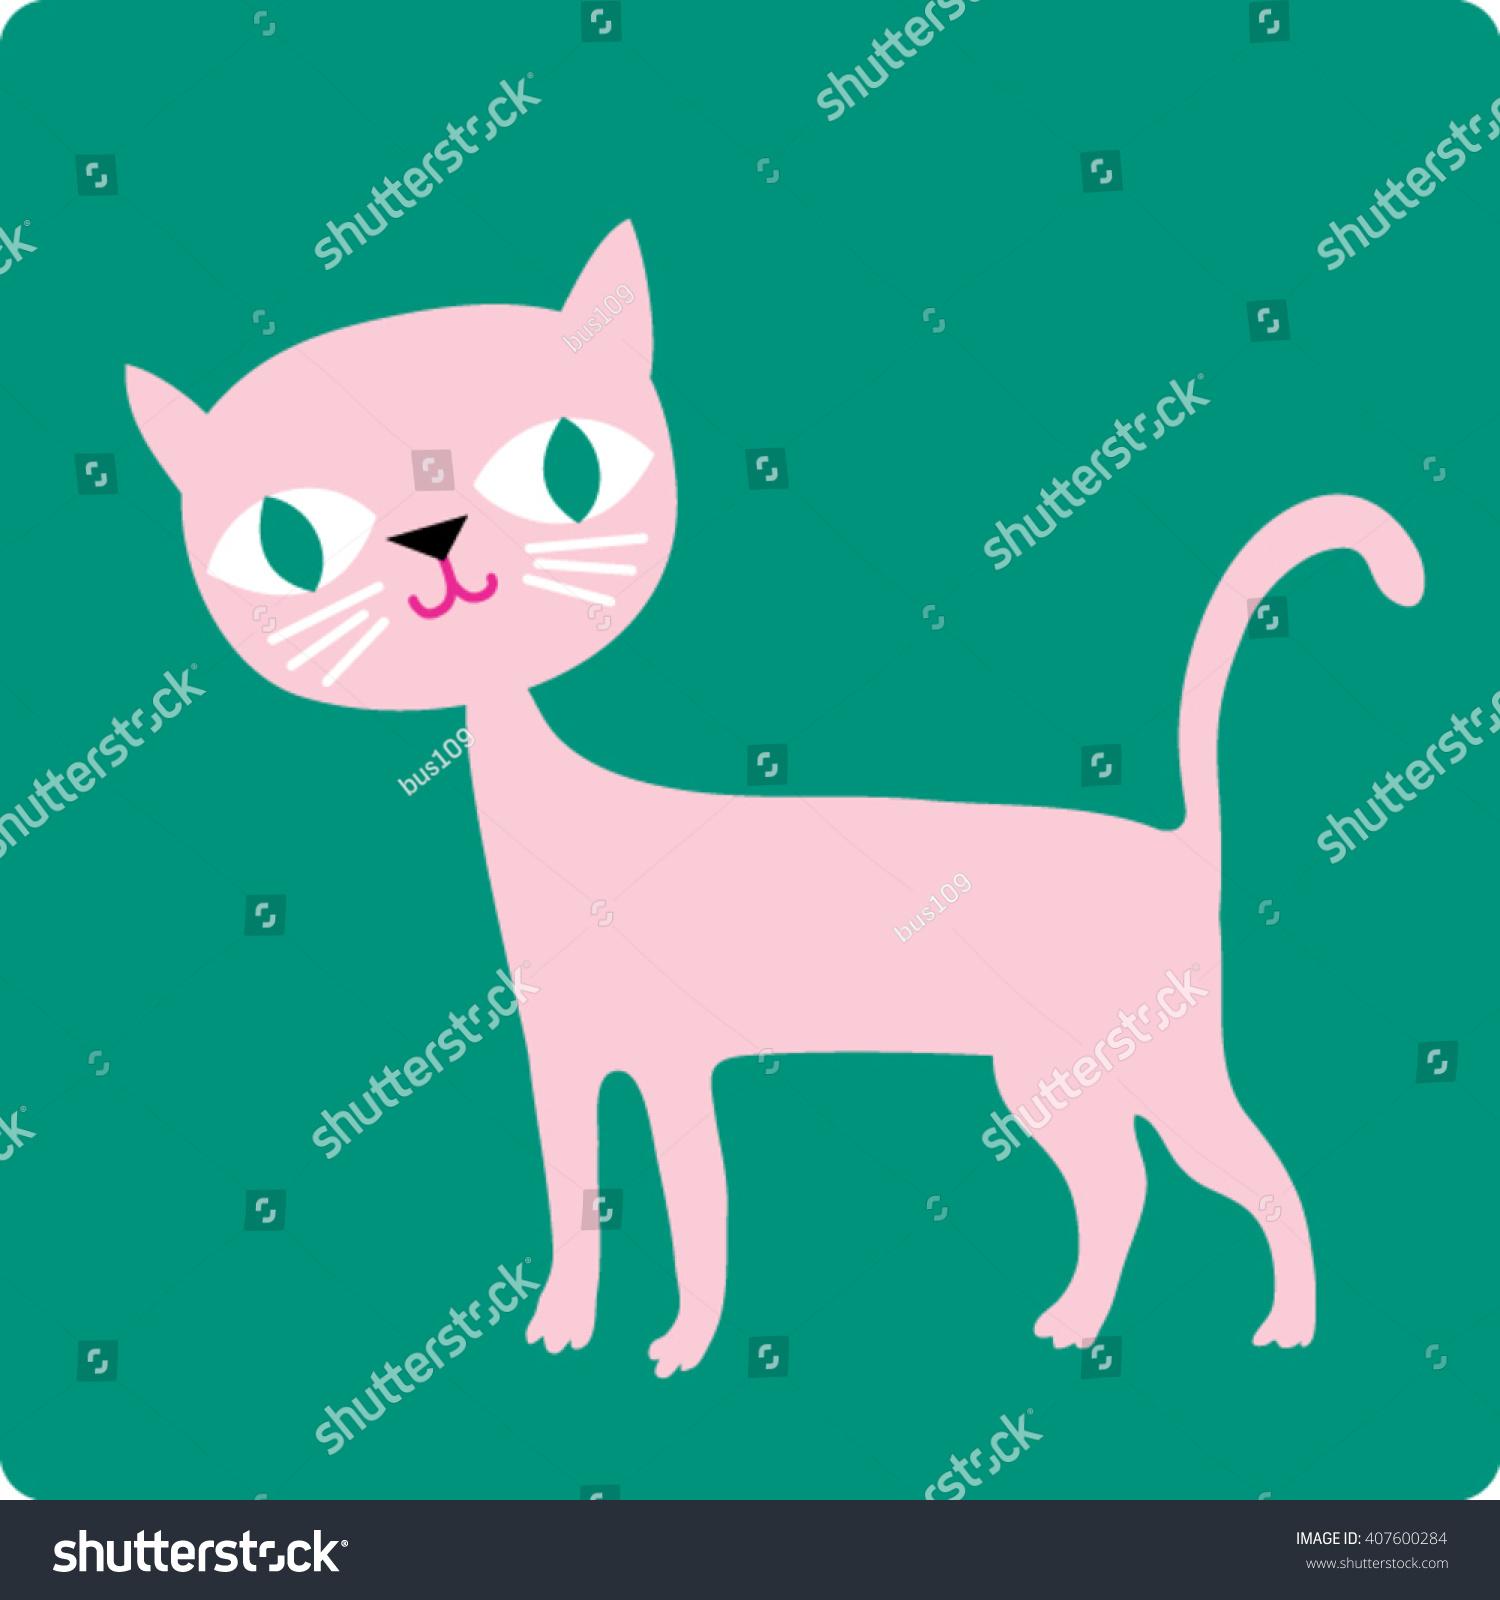 Cute Kitten Cartoon Pink Cat Vector Stock Vector